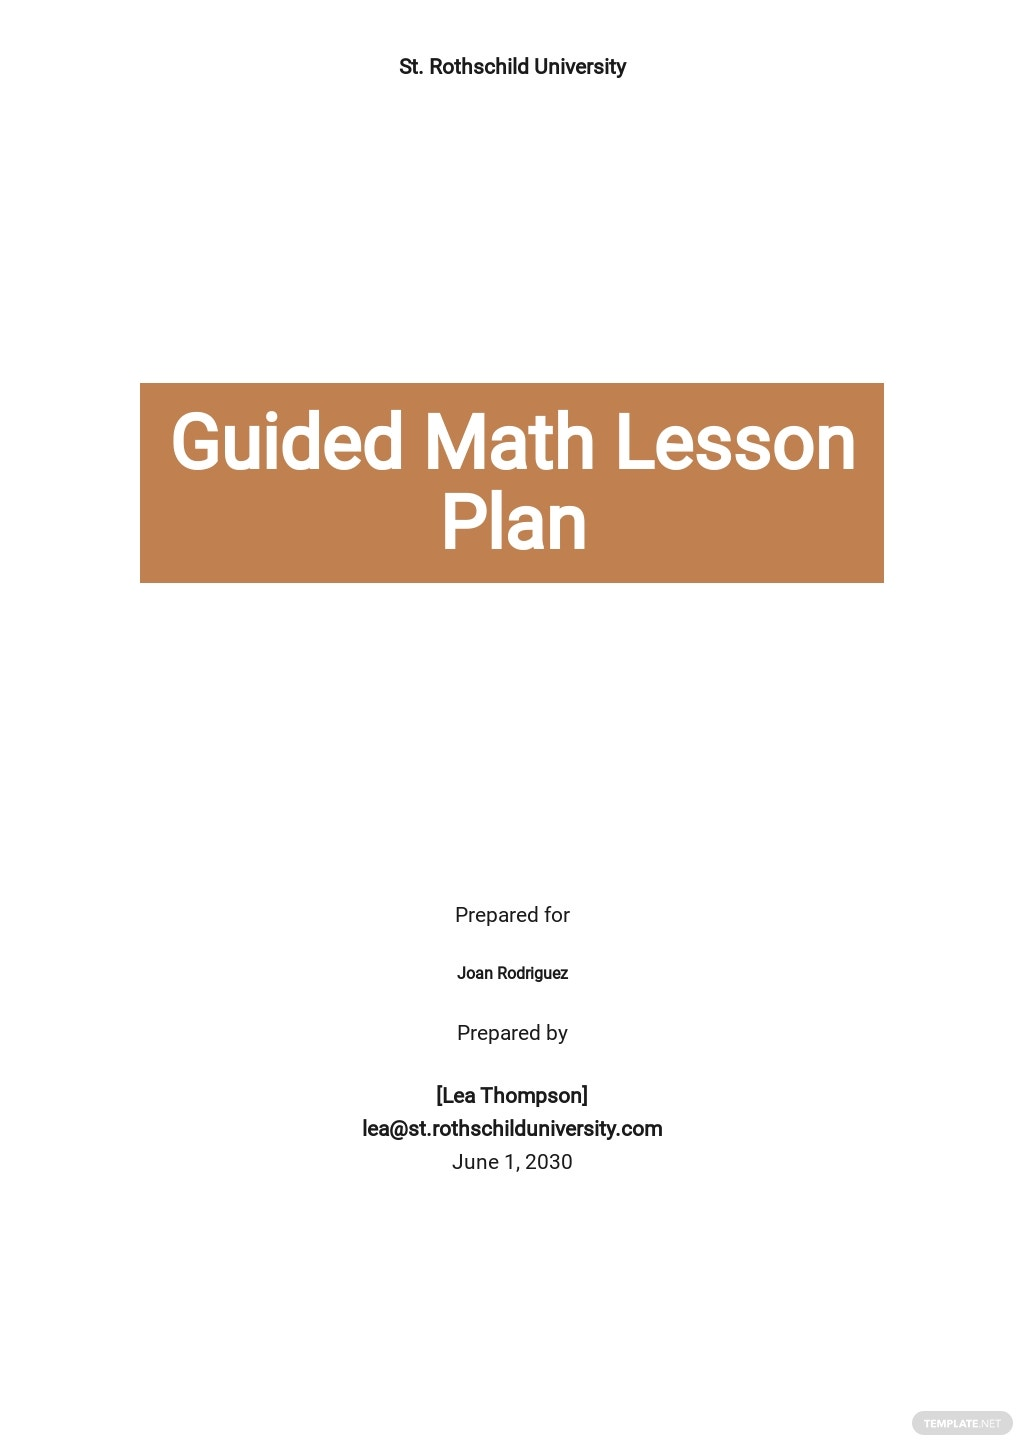 Guided Math Lesson Plan Template.jpe